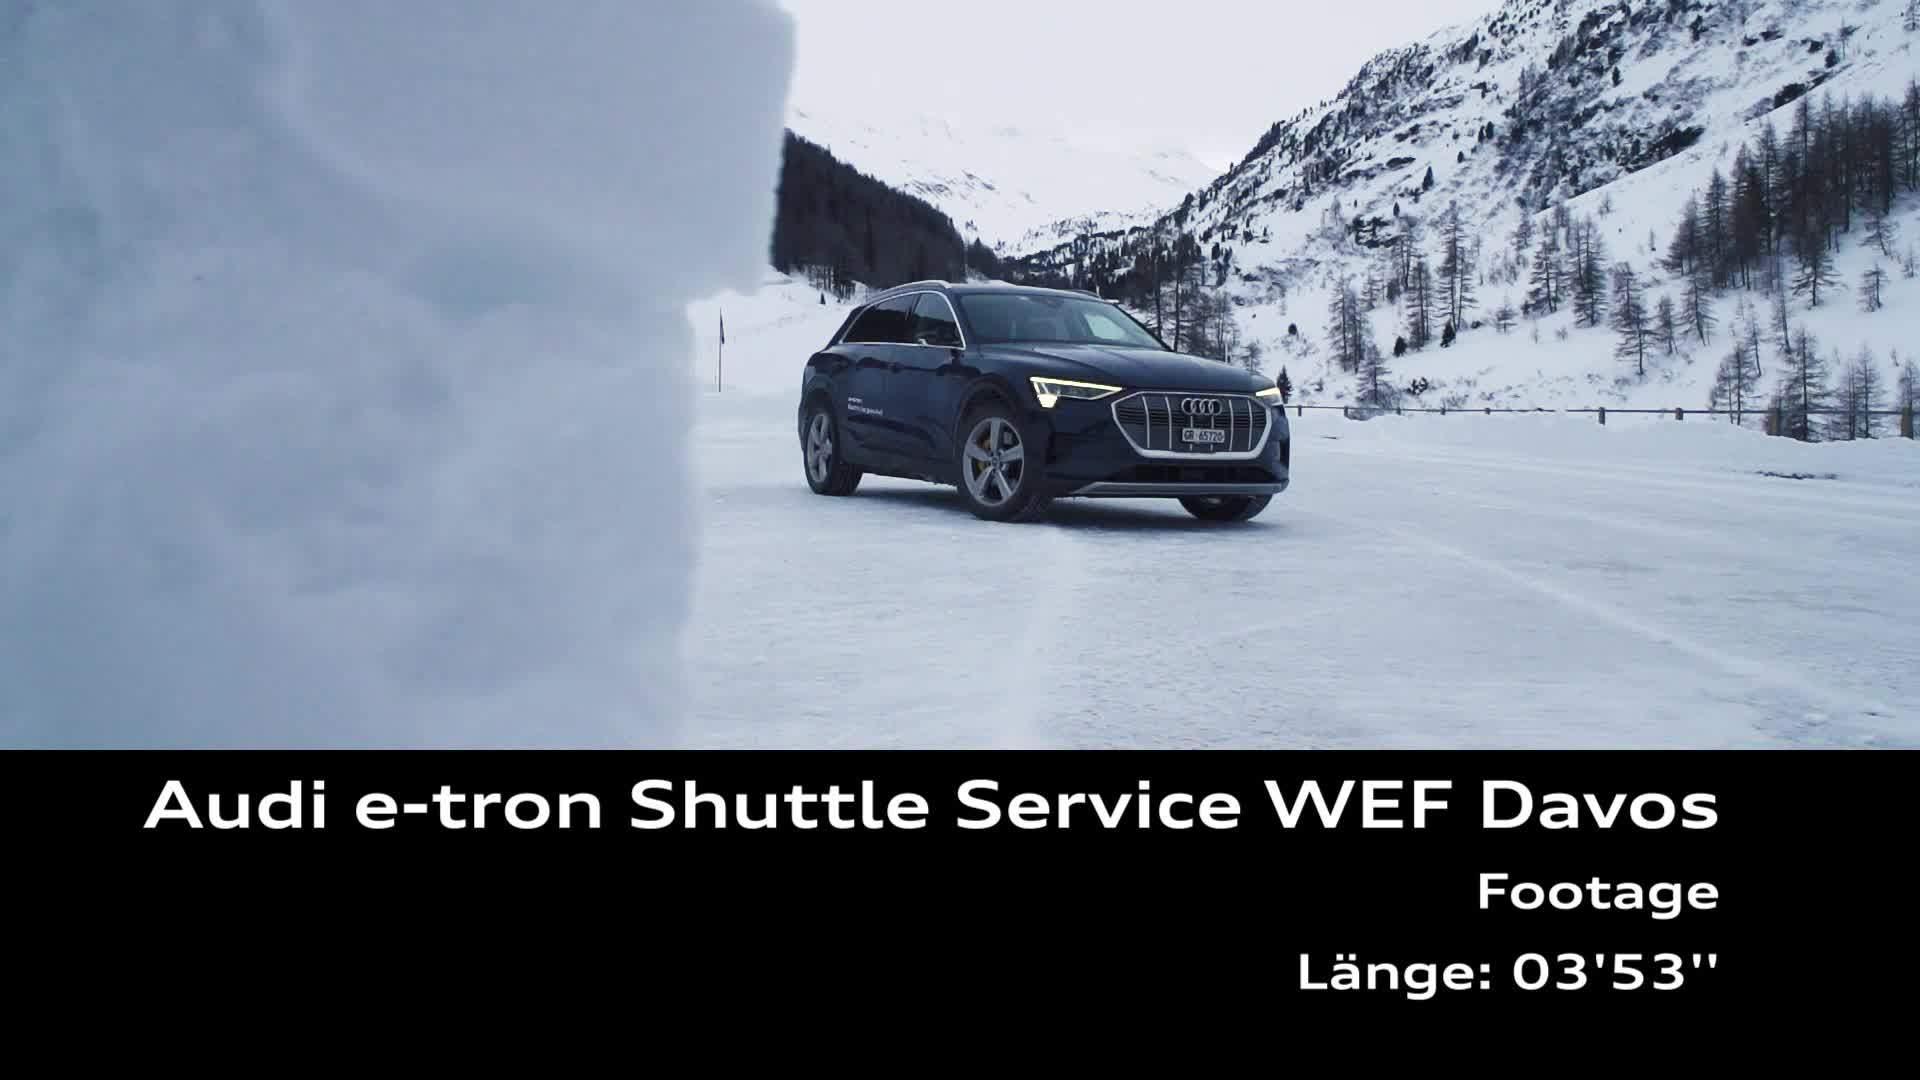 Footage Audi e-tron Shuttle Service WEF Davos